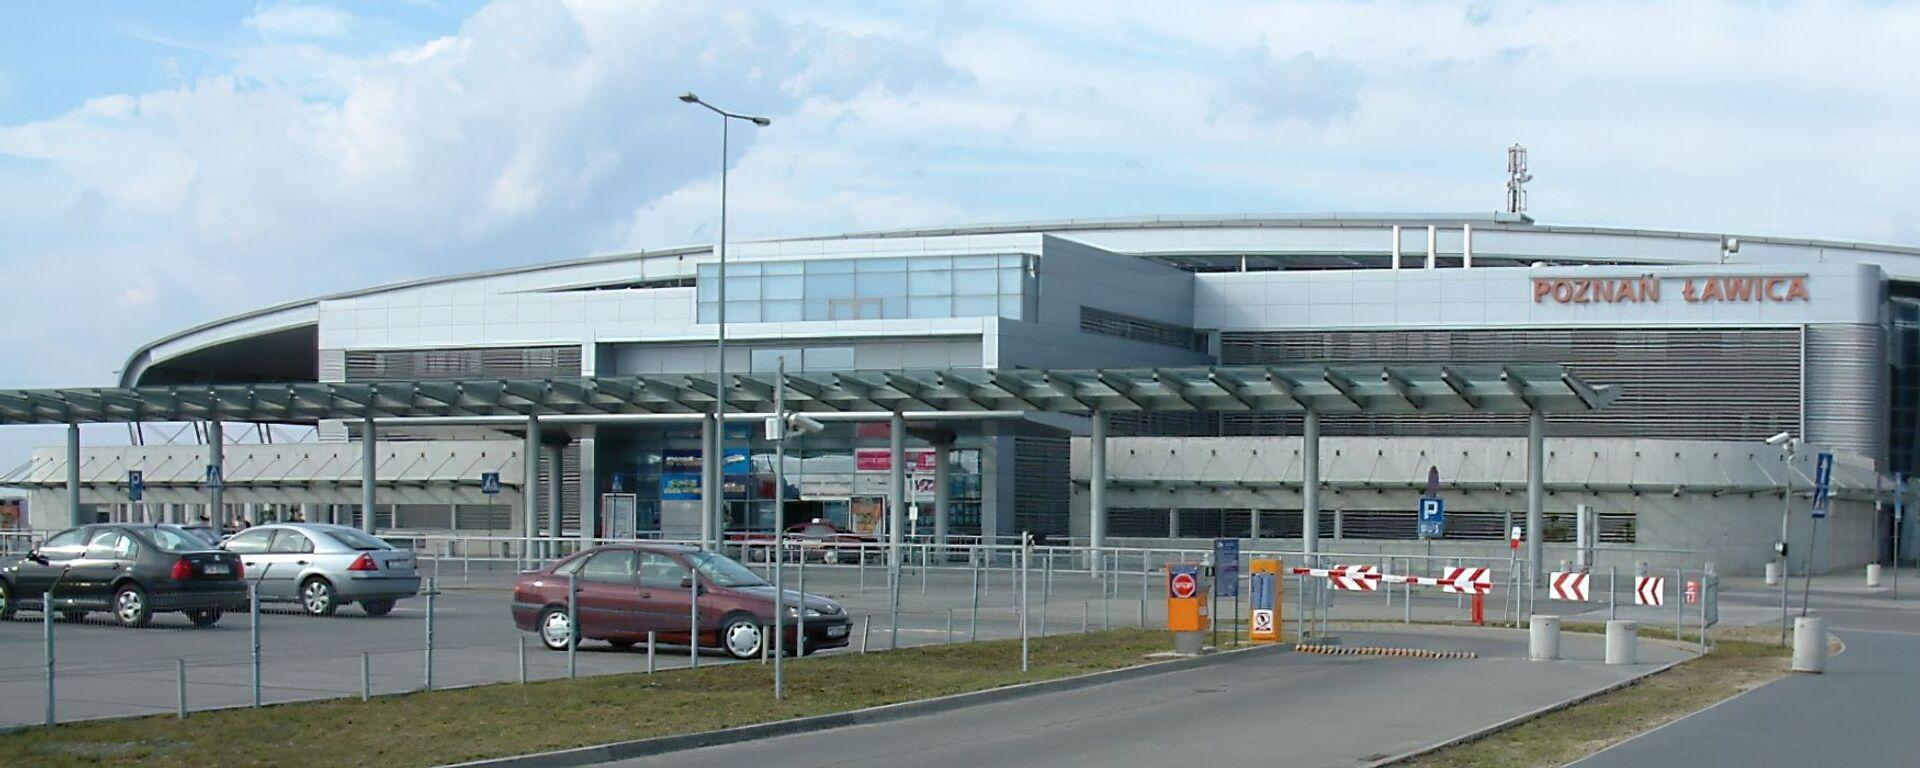 Lotnisko w Poznaniu - Sputnik Polska, 1920, 04.09.2021